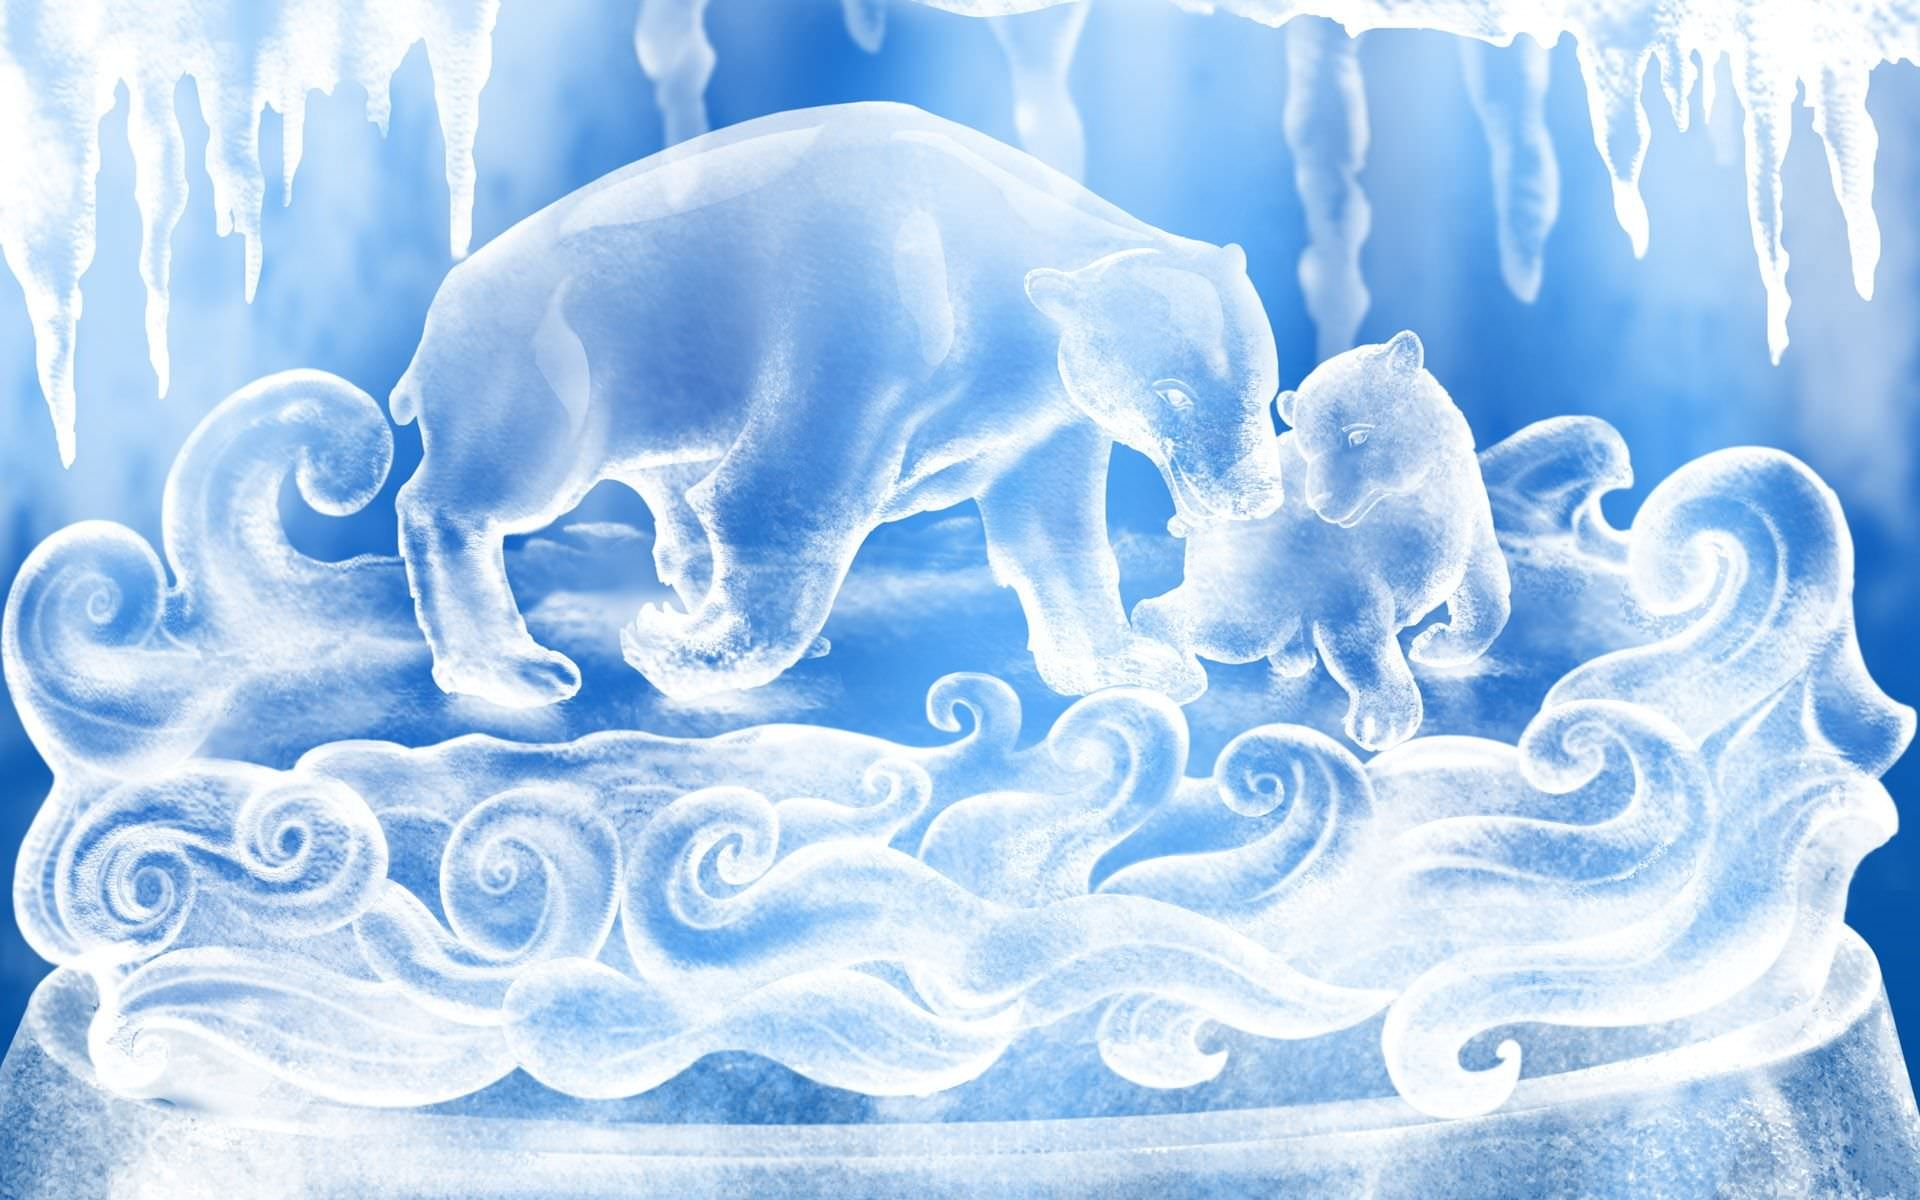 Polar Bear Ice Crystal Wallpaper